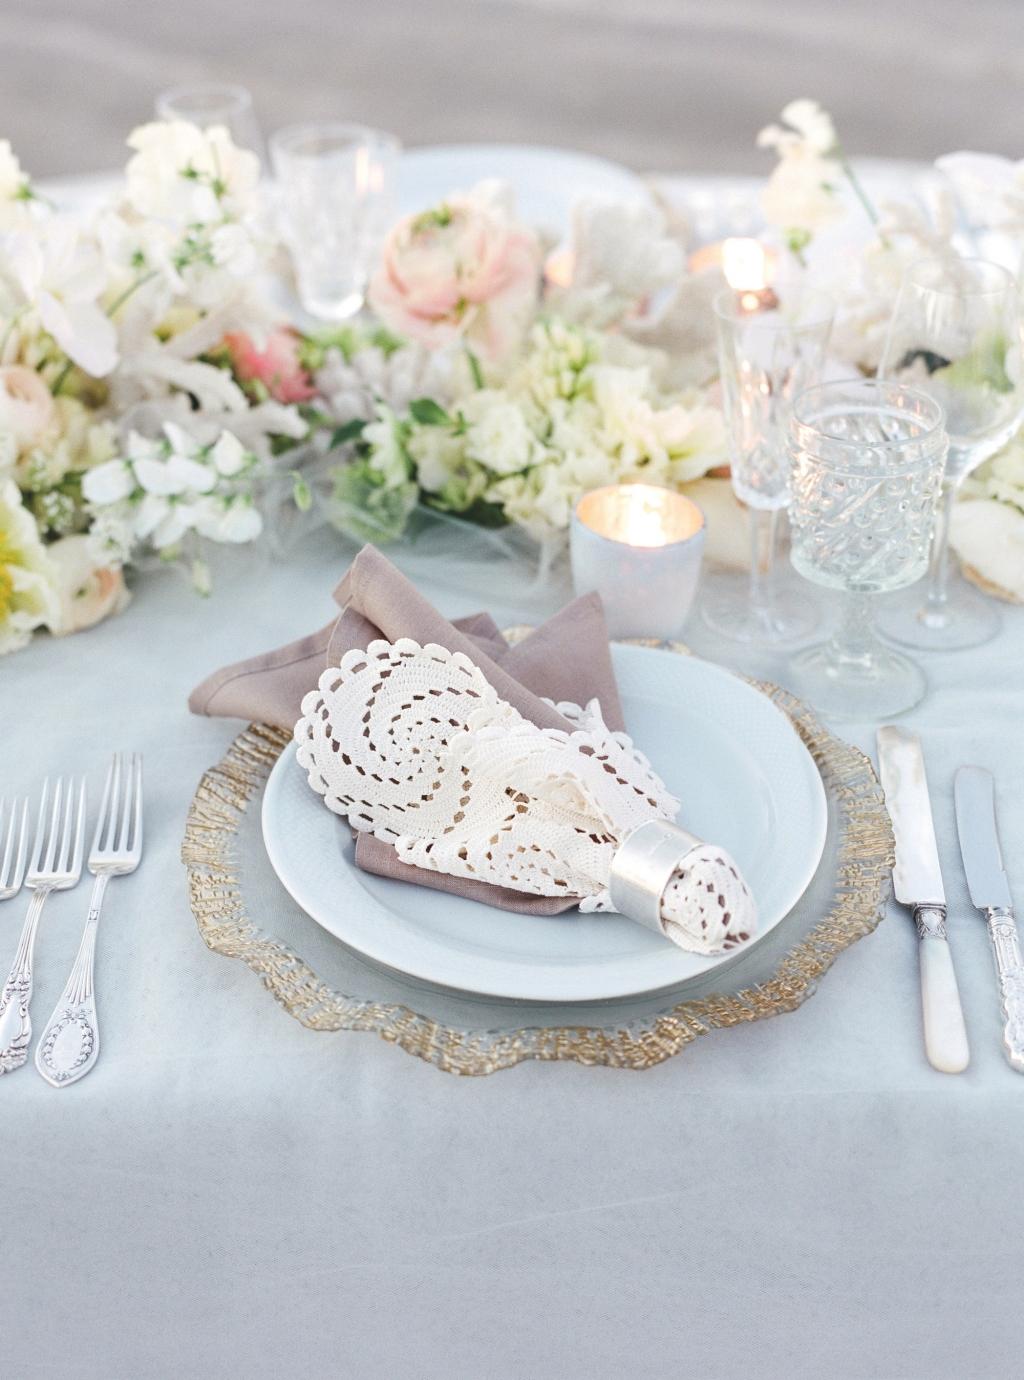 Elegant Destination Wedding Ideas for the Beach | Charleston Photo Shoot